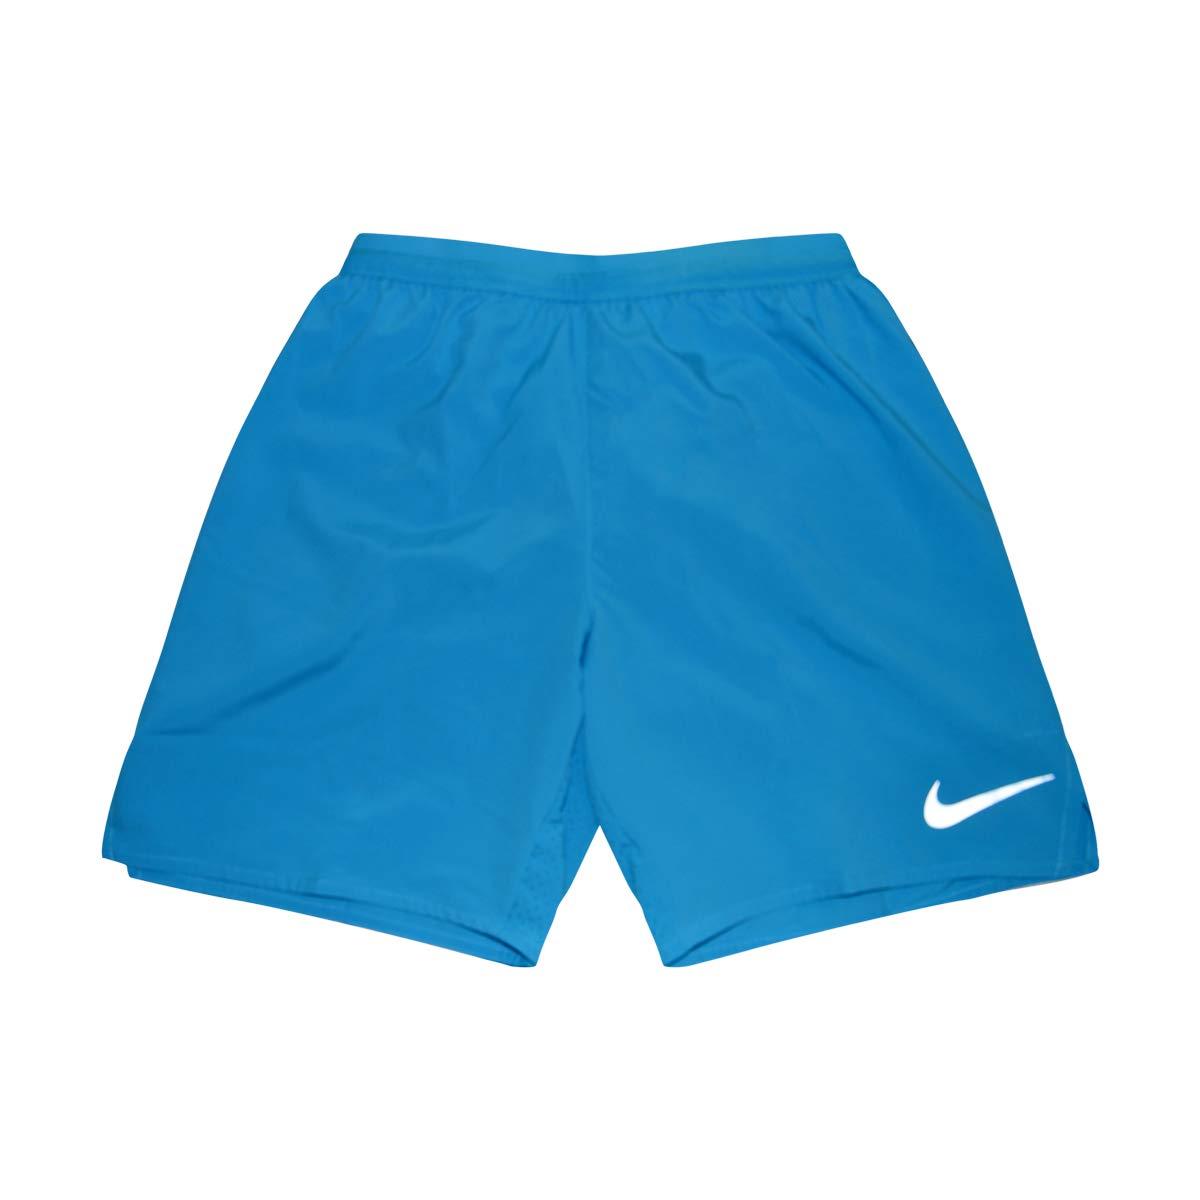 Nike Air Max 90 333888, Herren Low-Top Turnschuhe